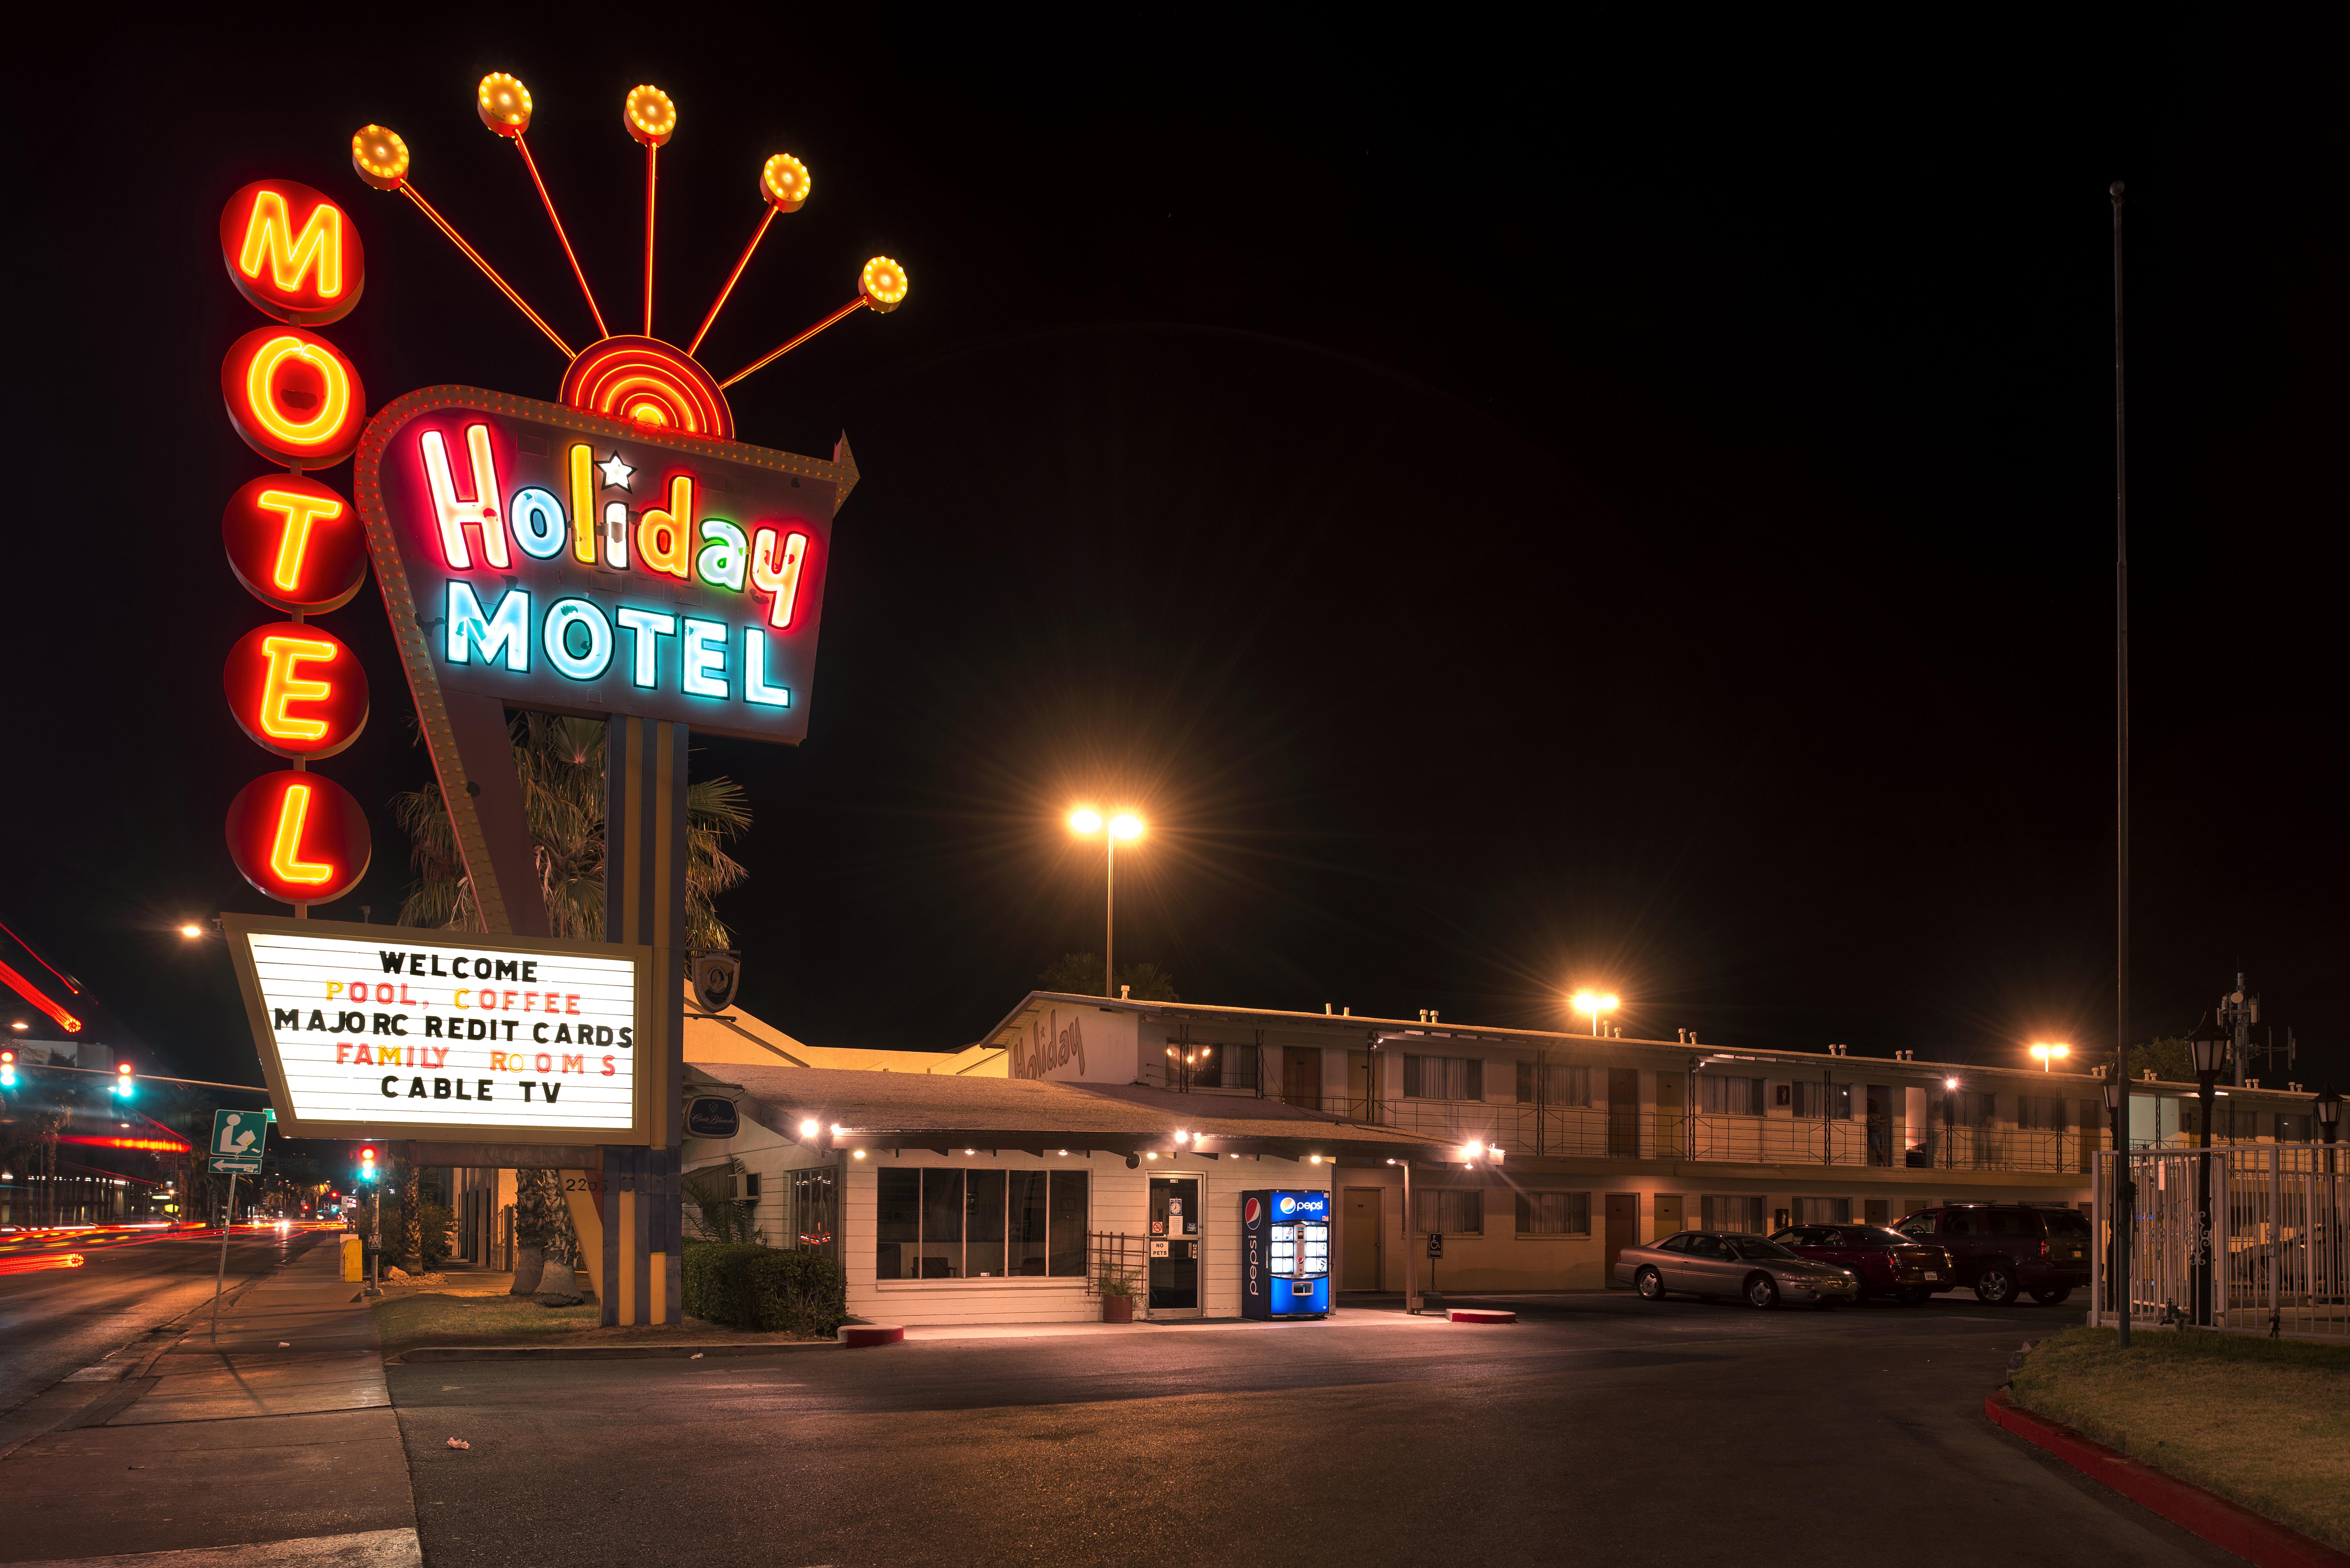 Holiday Motel - 2211 South Las Vegas Boulevard, Las Vegas, Nevada U.S.A. - May 14, 2013